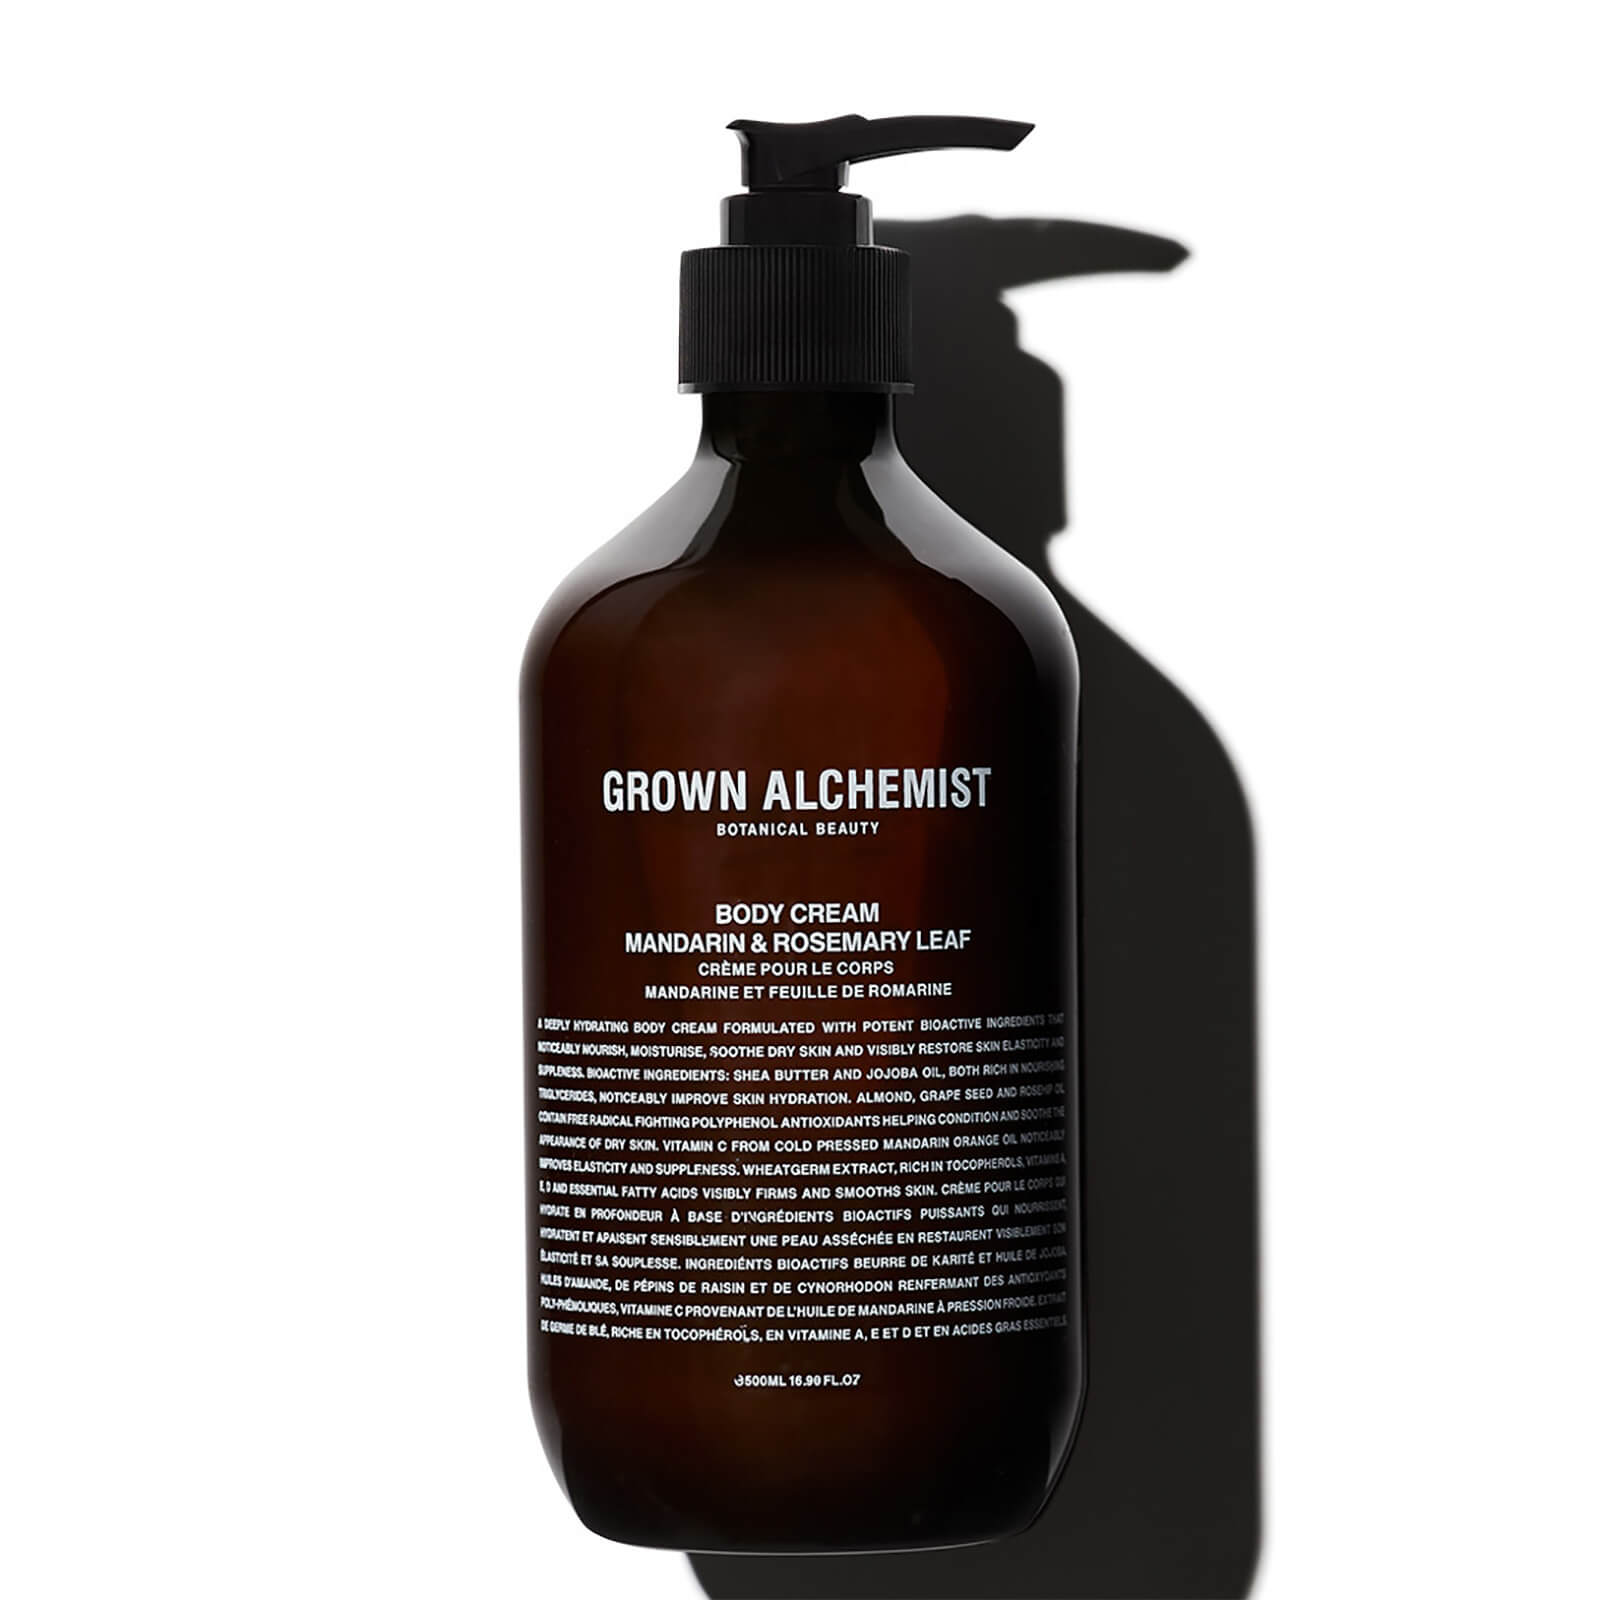 Купить Grown Alchemist Body Cream - Mandarin, Rosemary Leaf 500ml